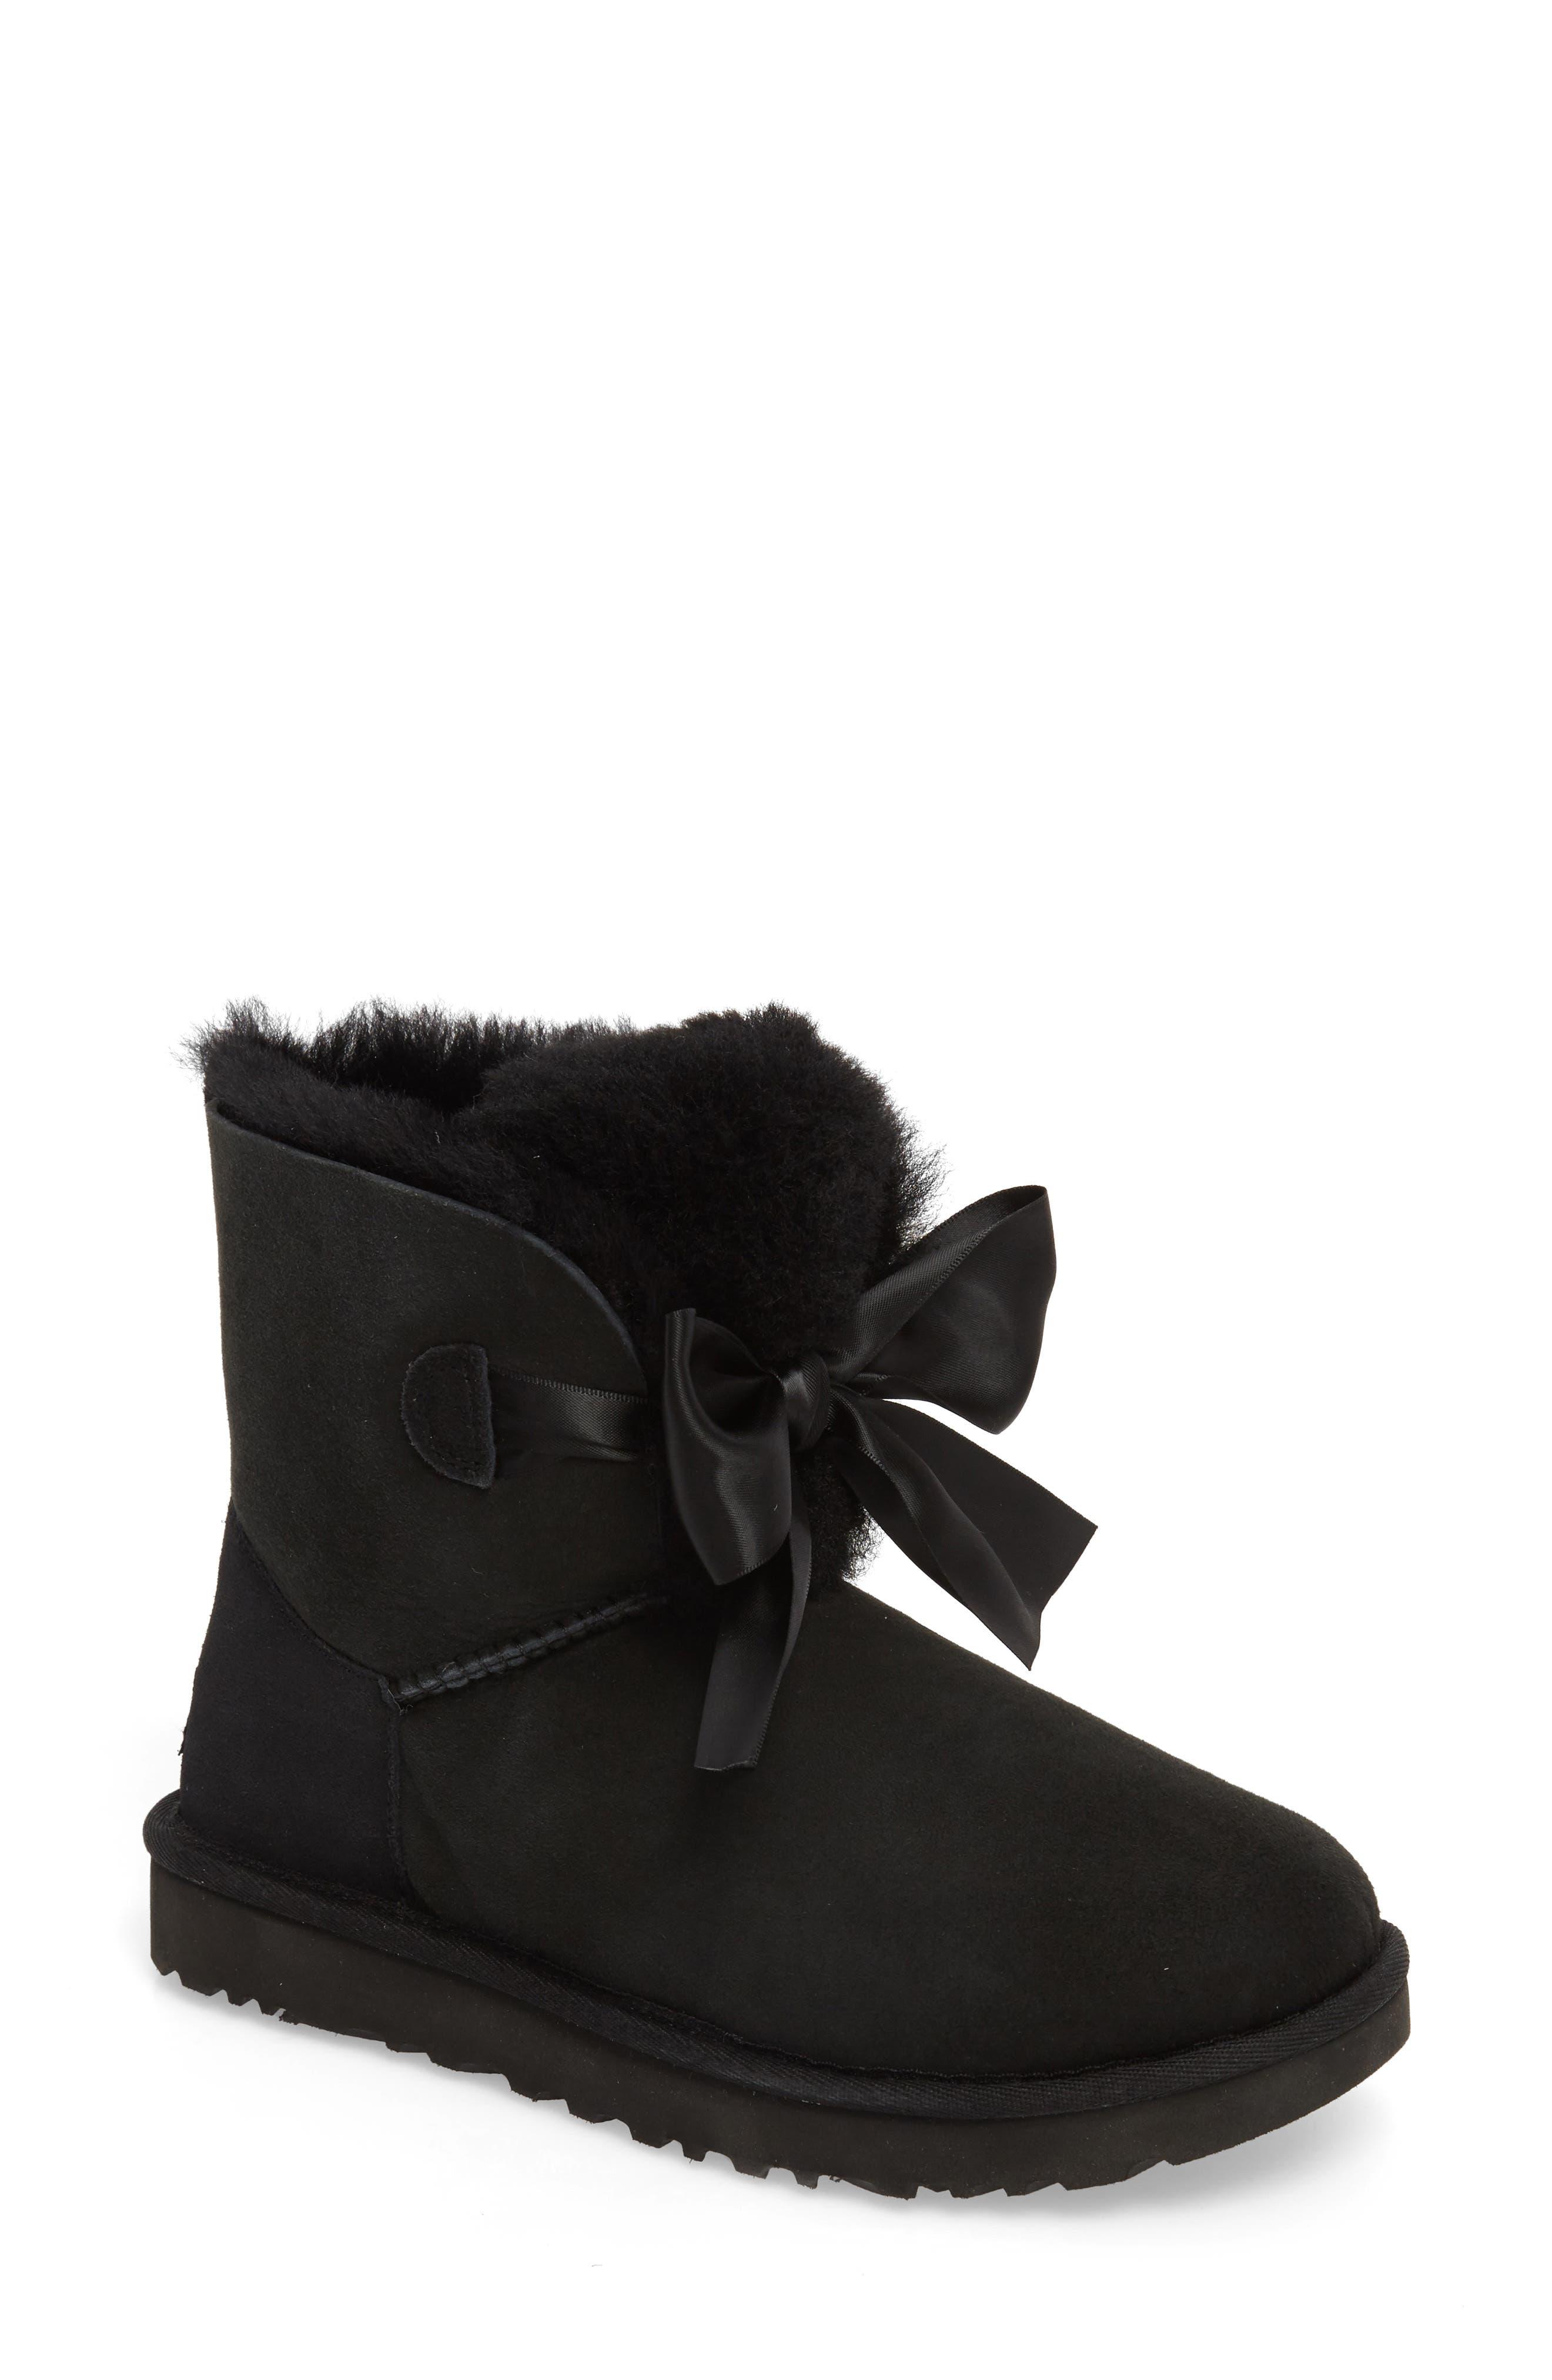 black ugg snow boots